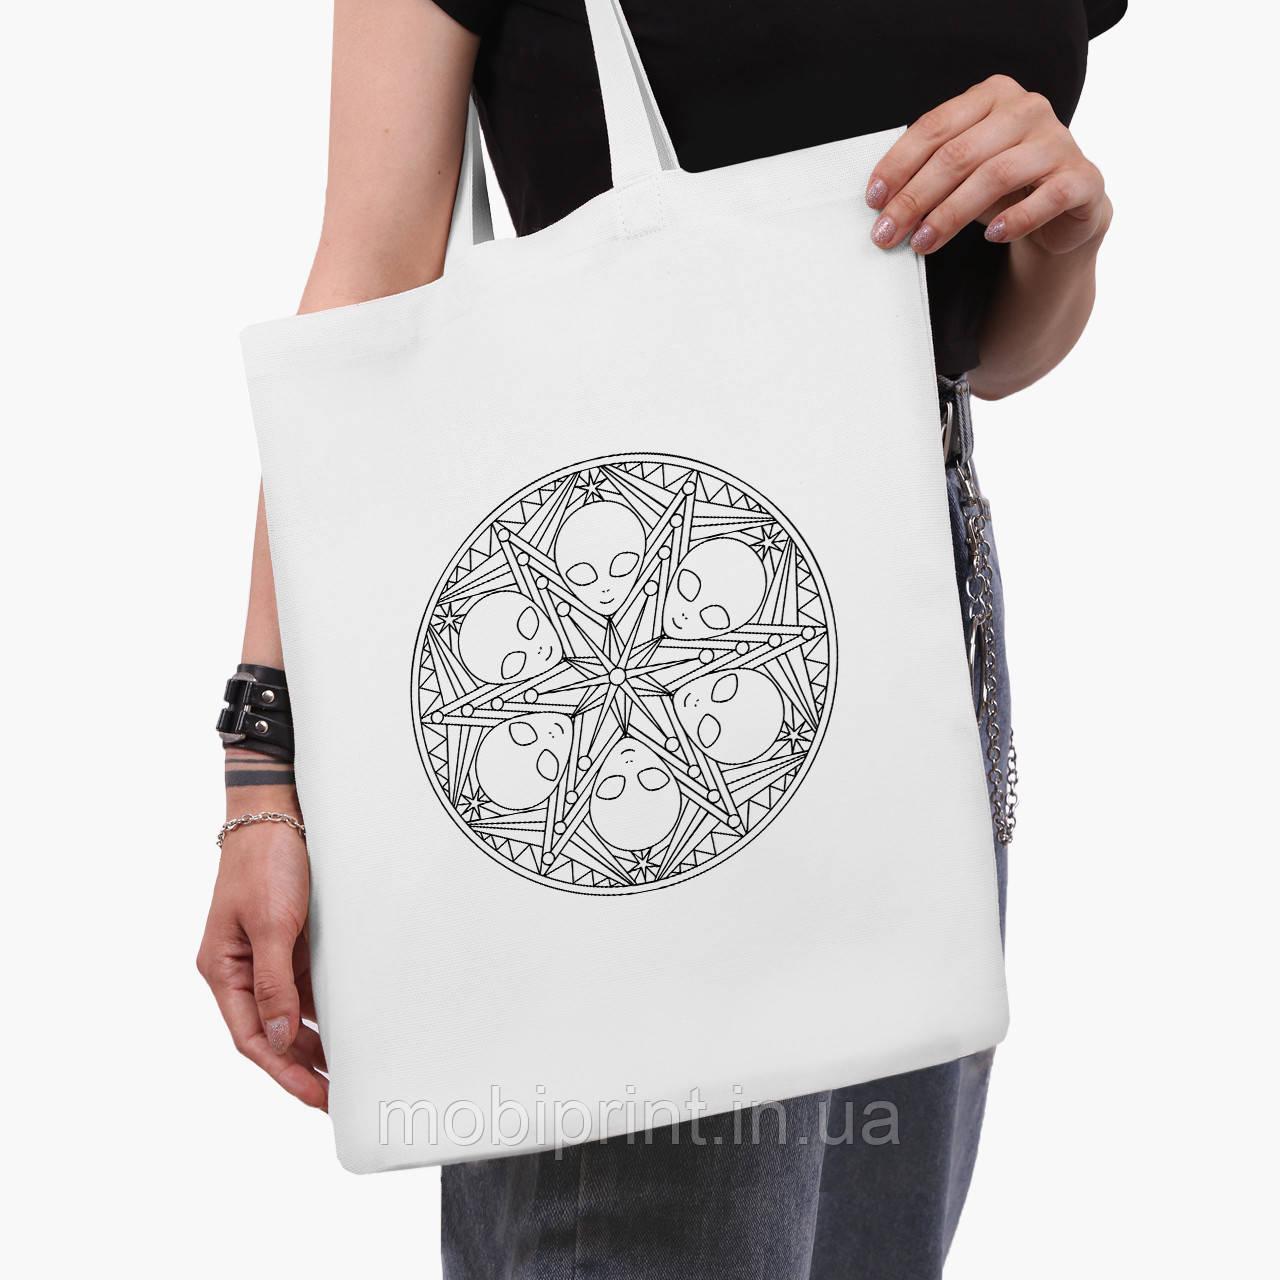 Еко сумка шоппер біла Инопланетяни (Aliens) (9227-2852-3) 41*35 см